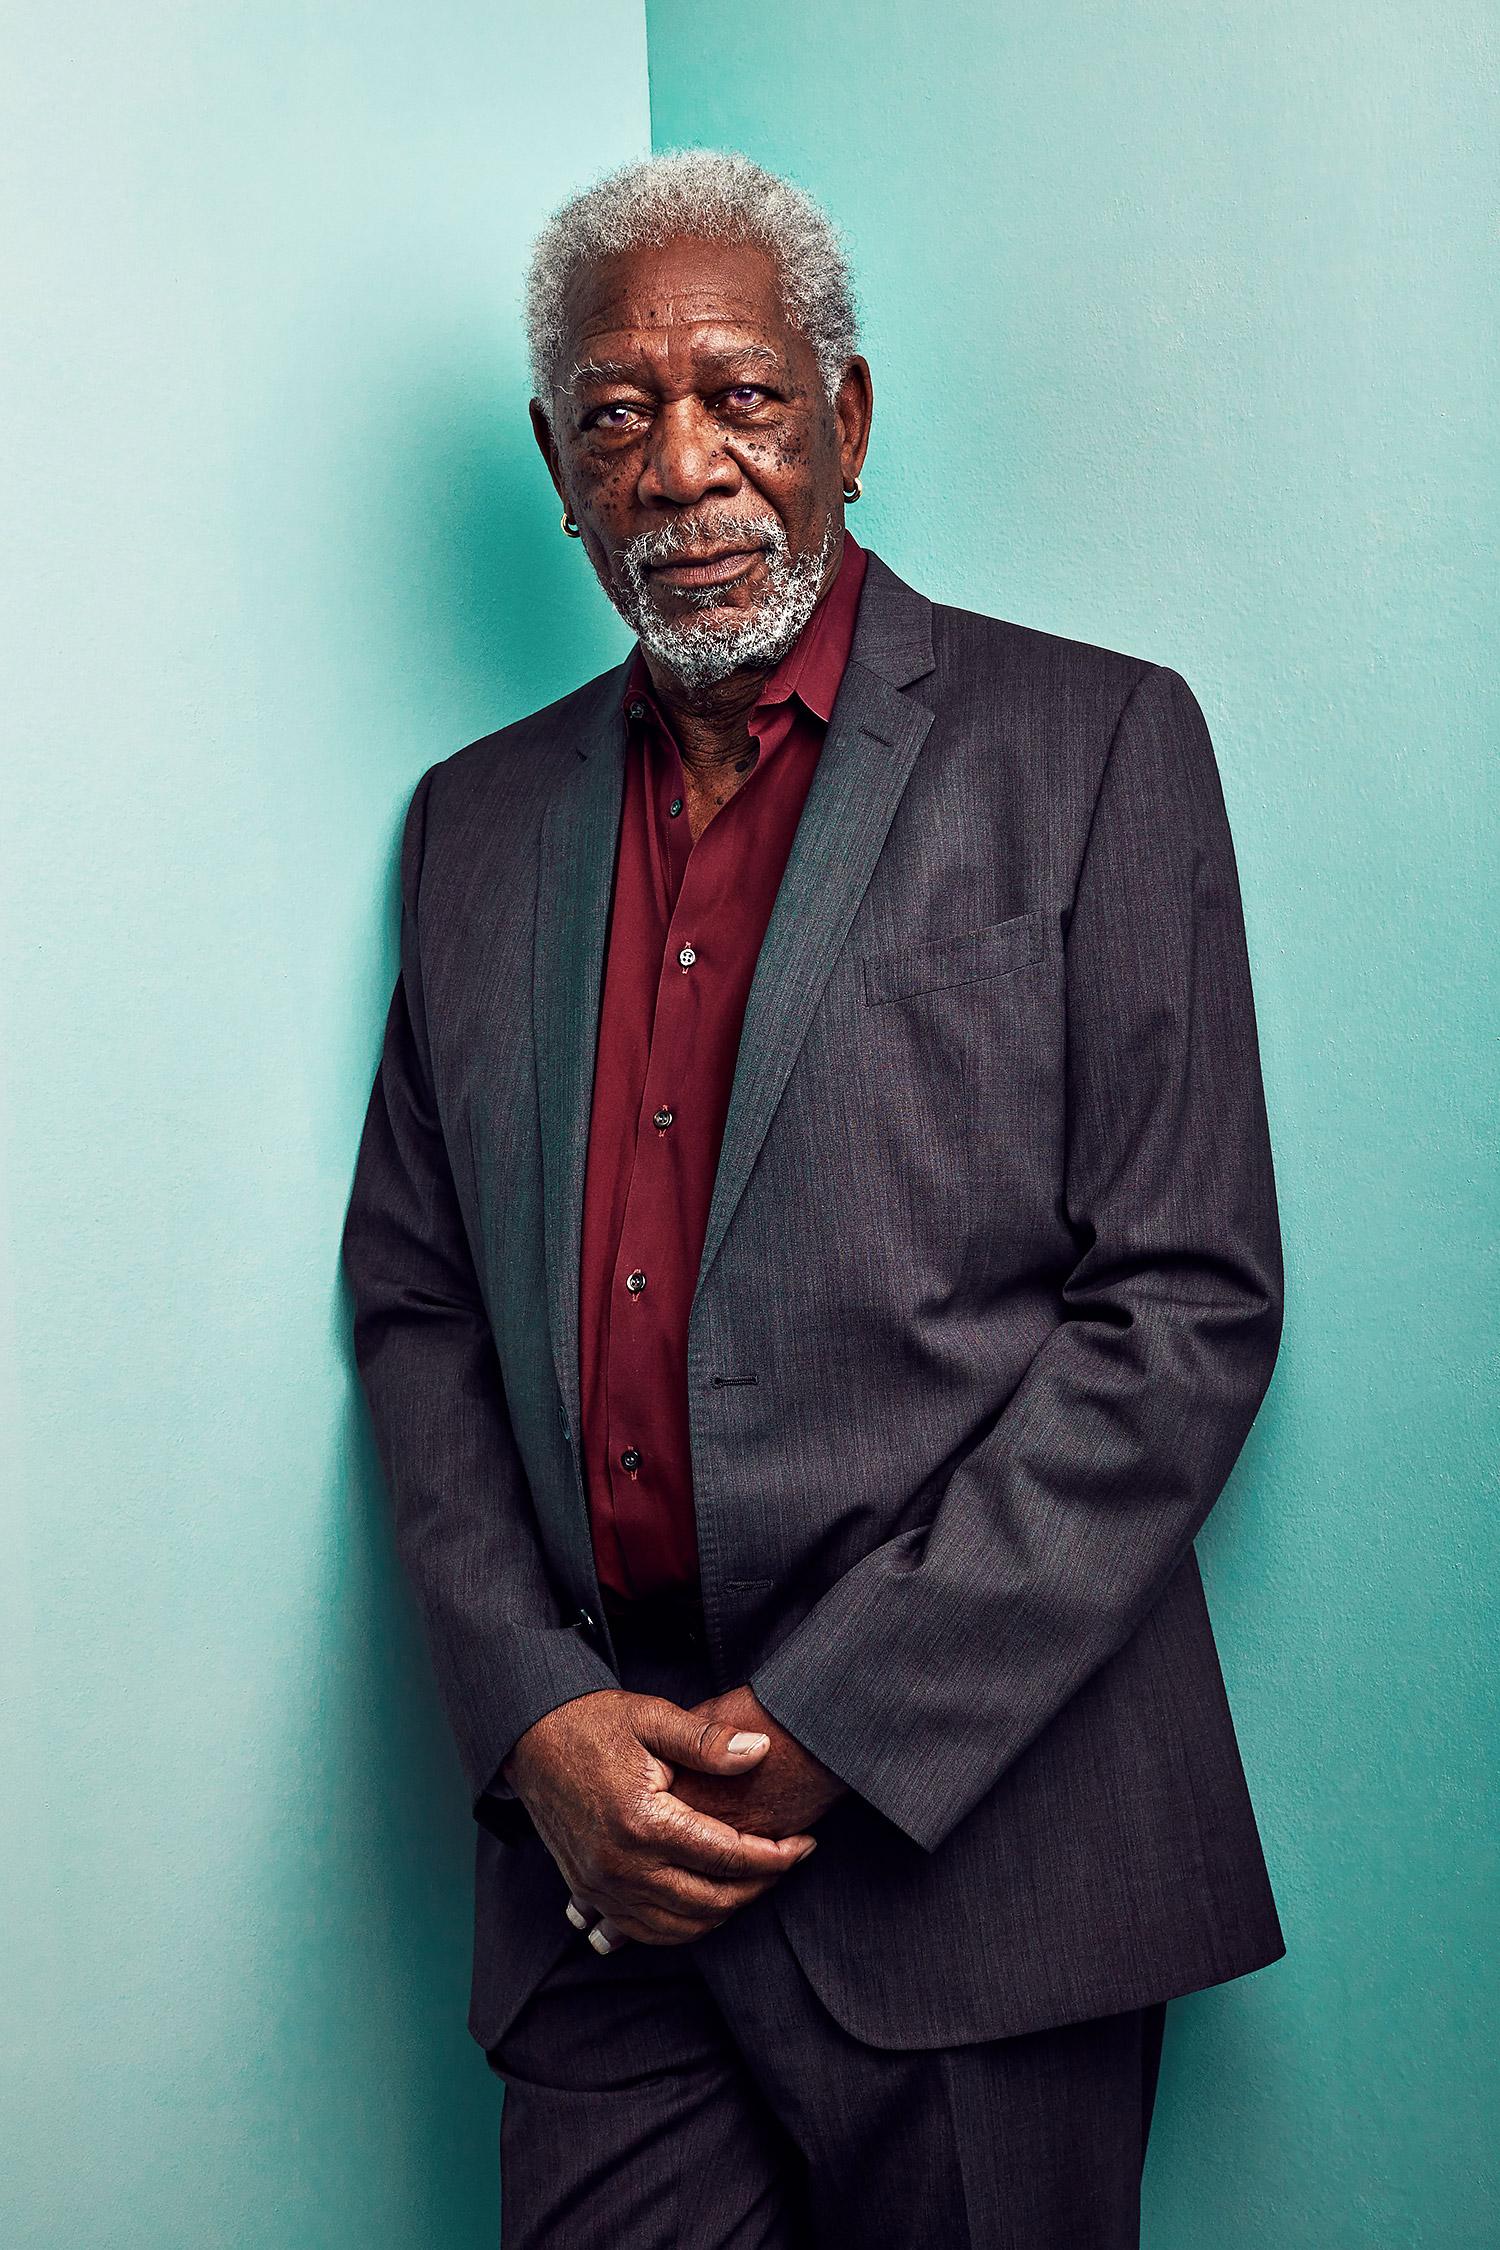 Morgan Freeman se diz devastado e que nunca praticou assédio sexual na vida